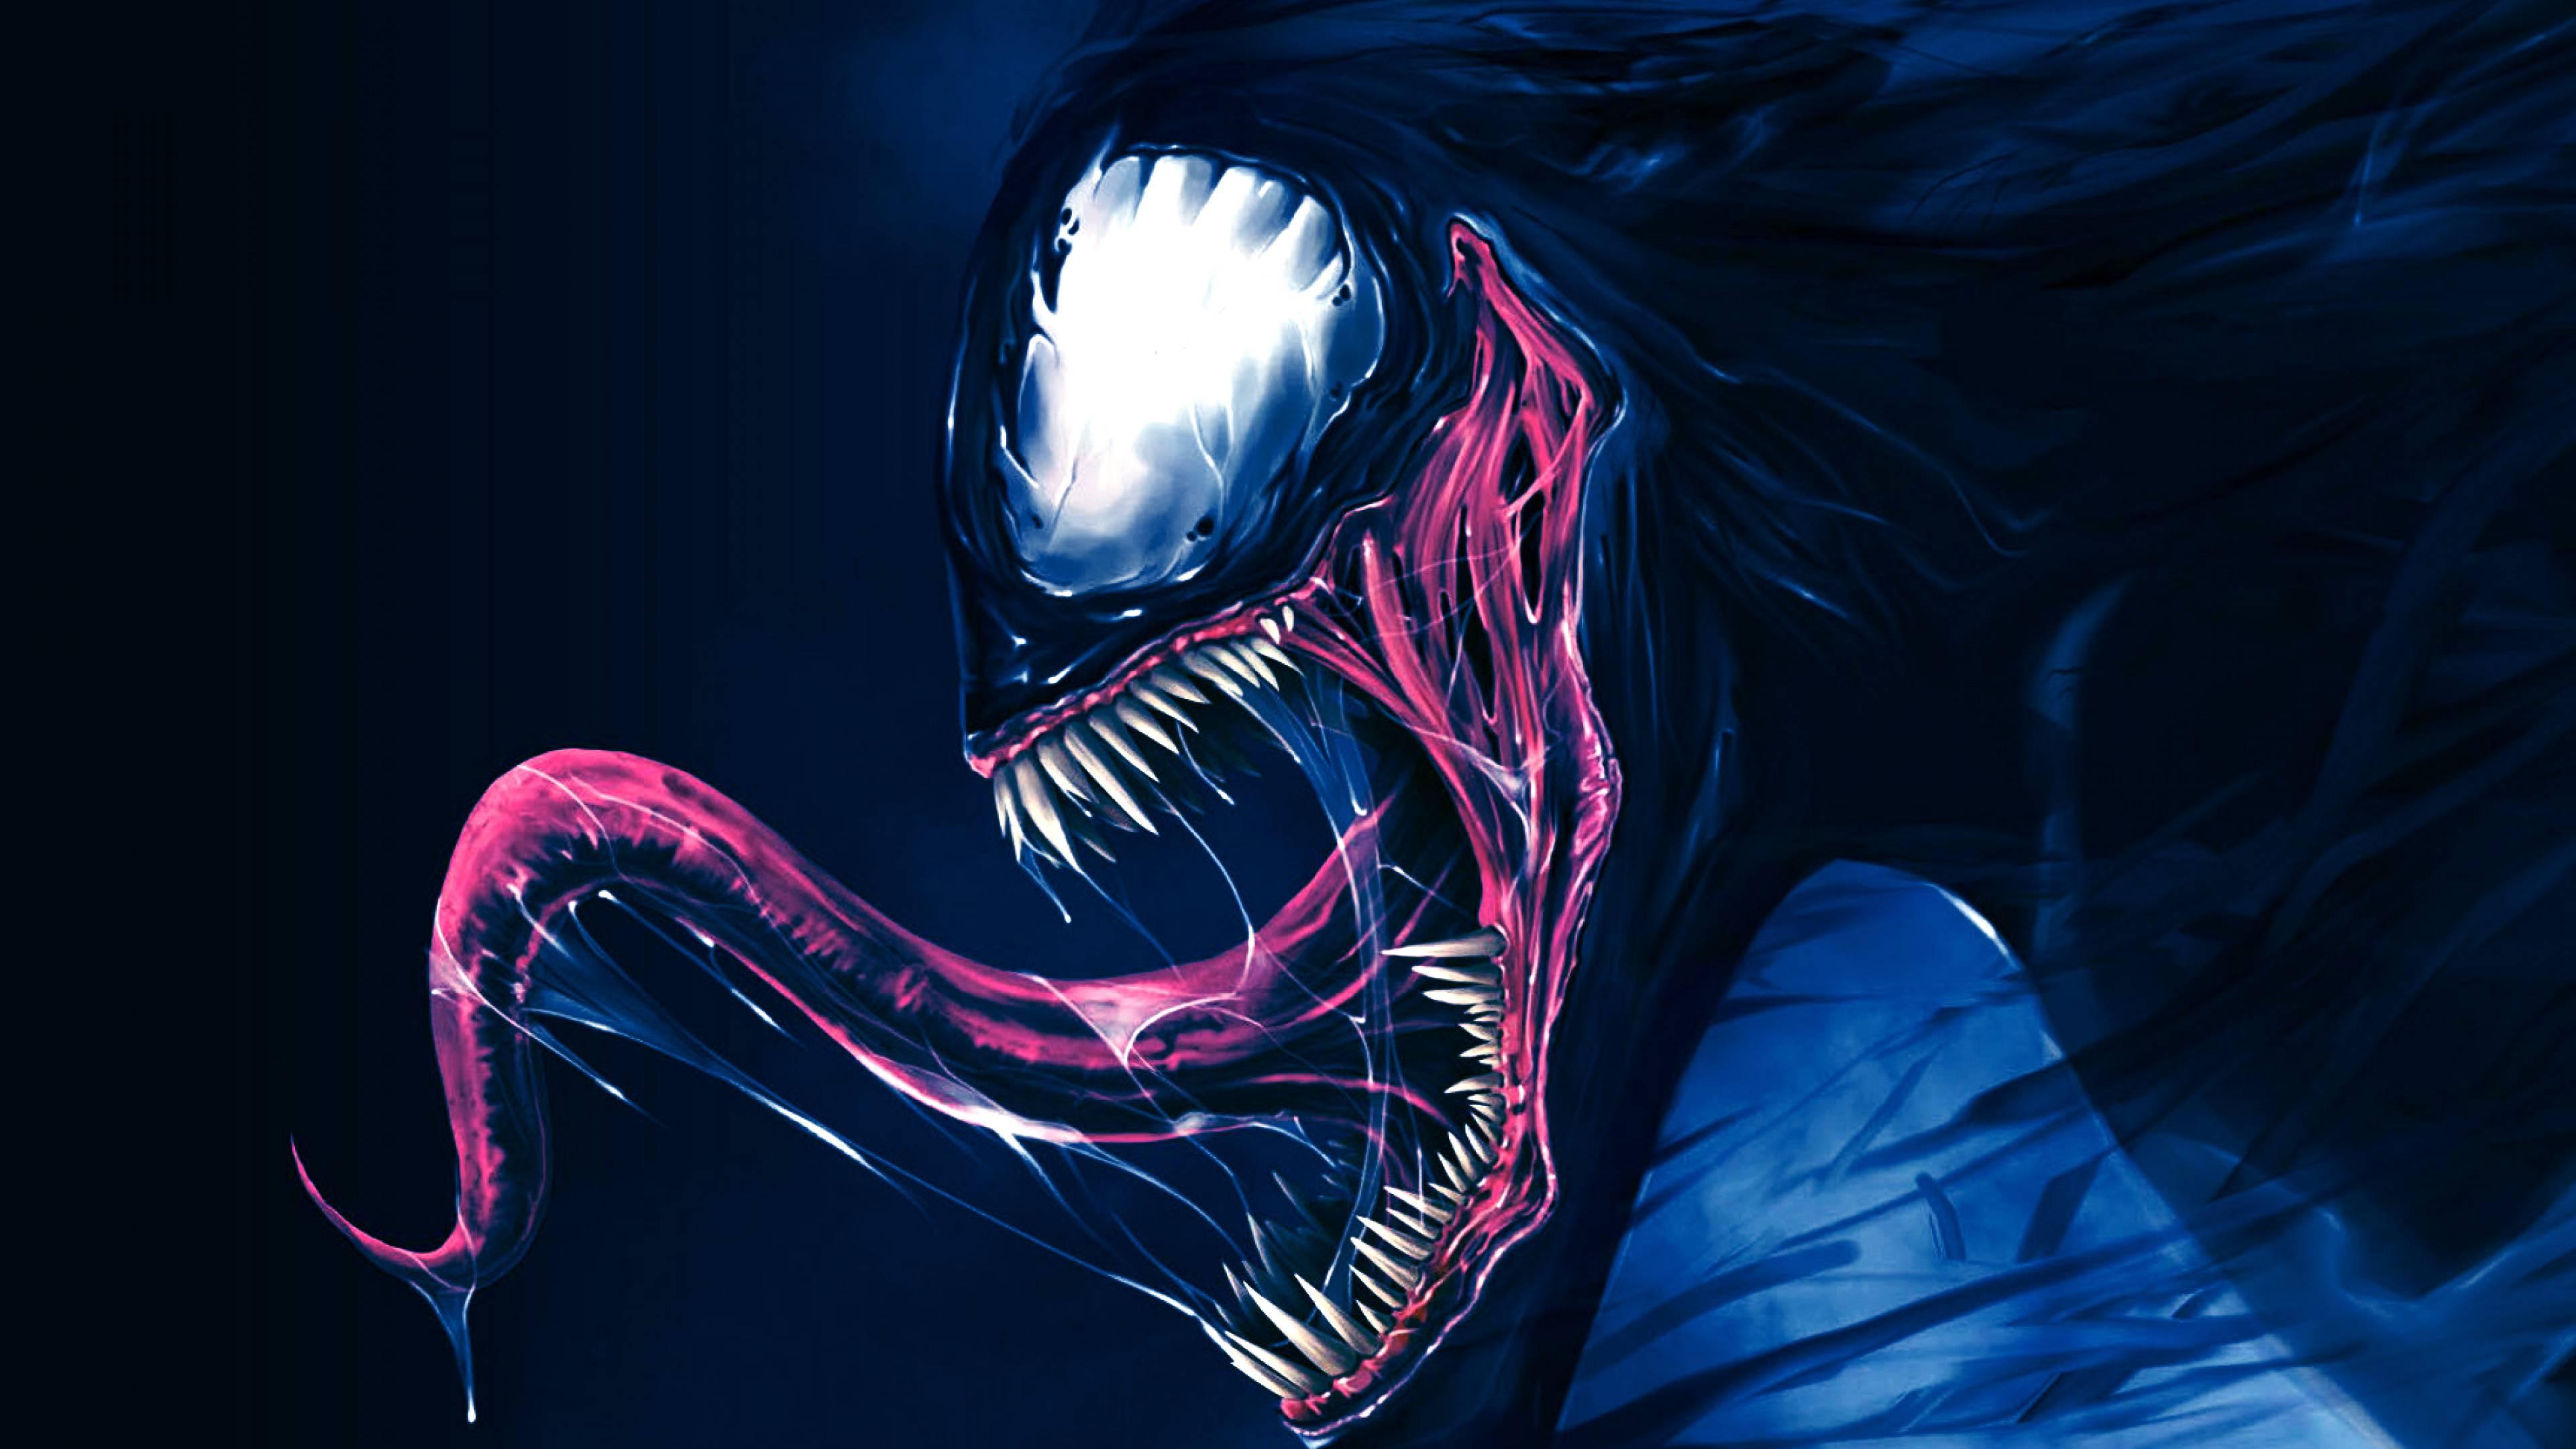 venom hd wallpaper android